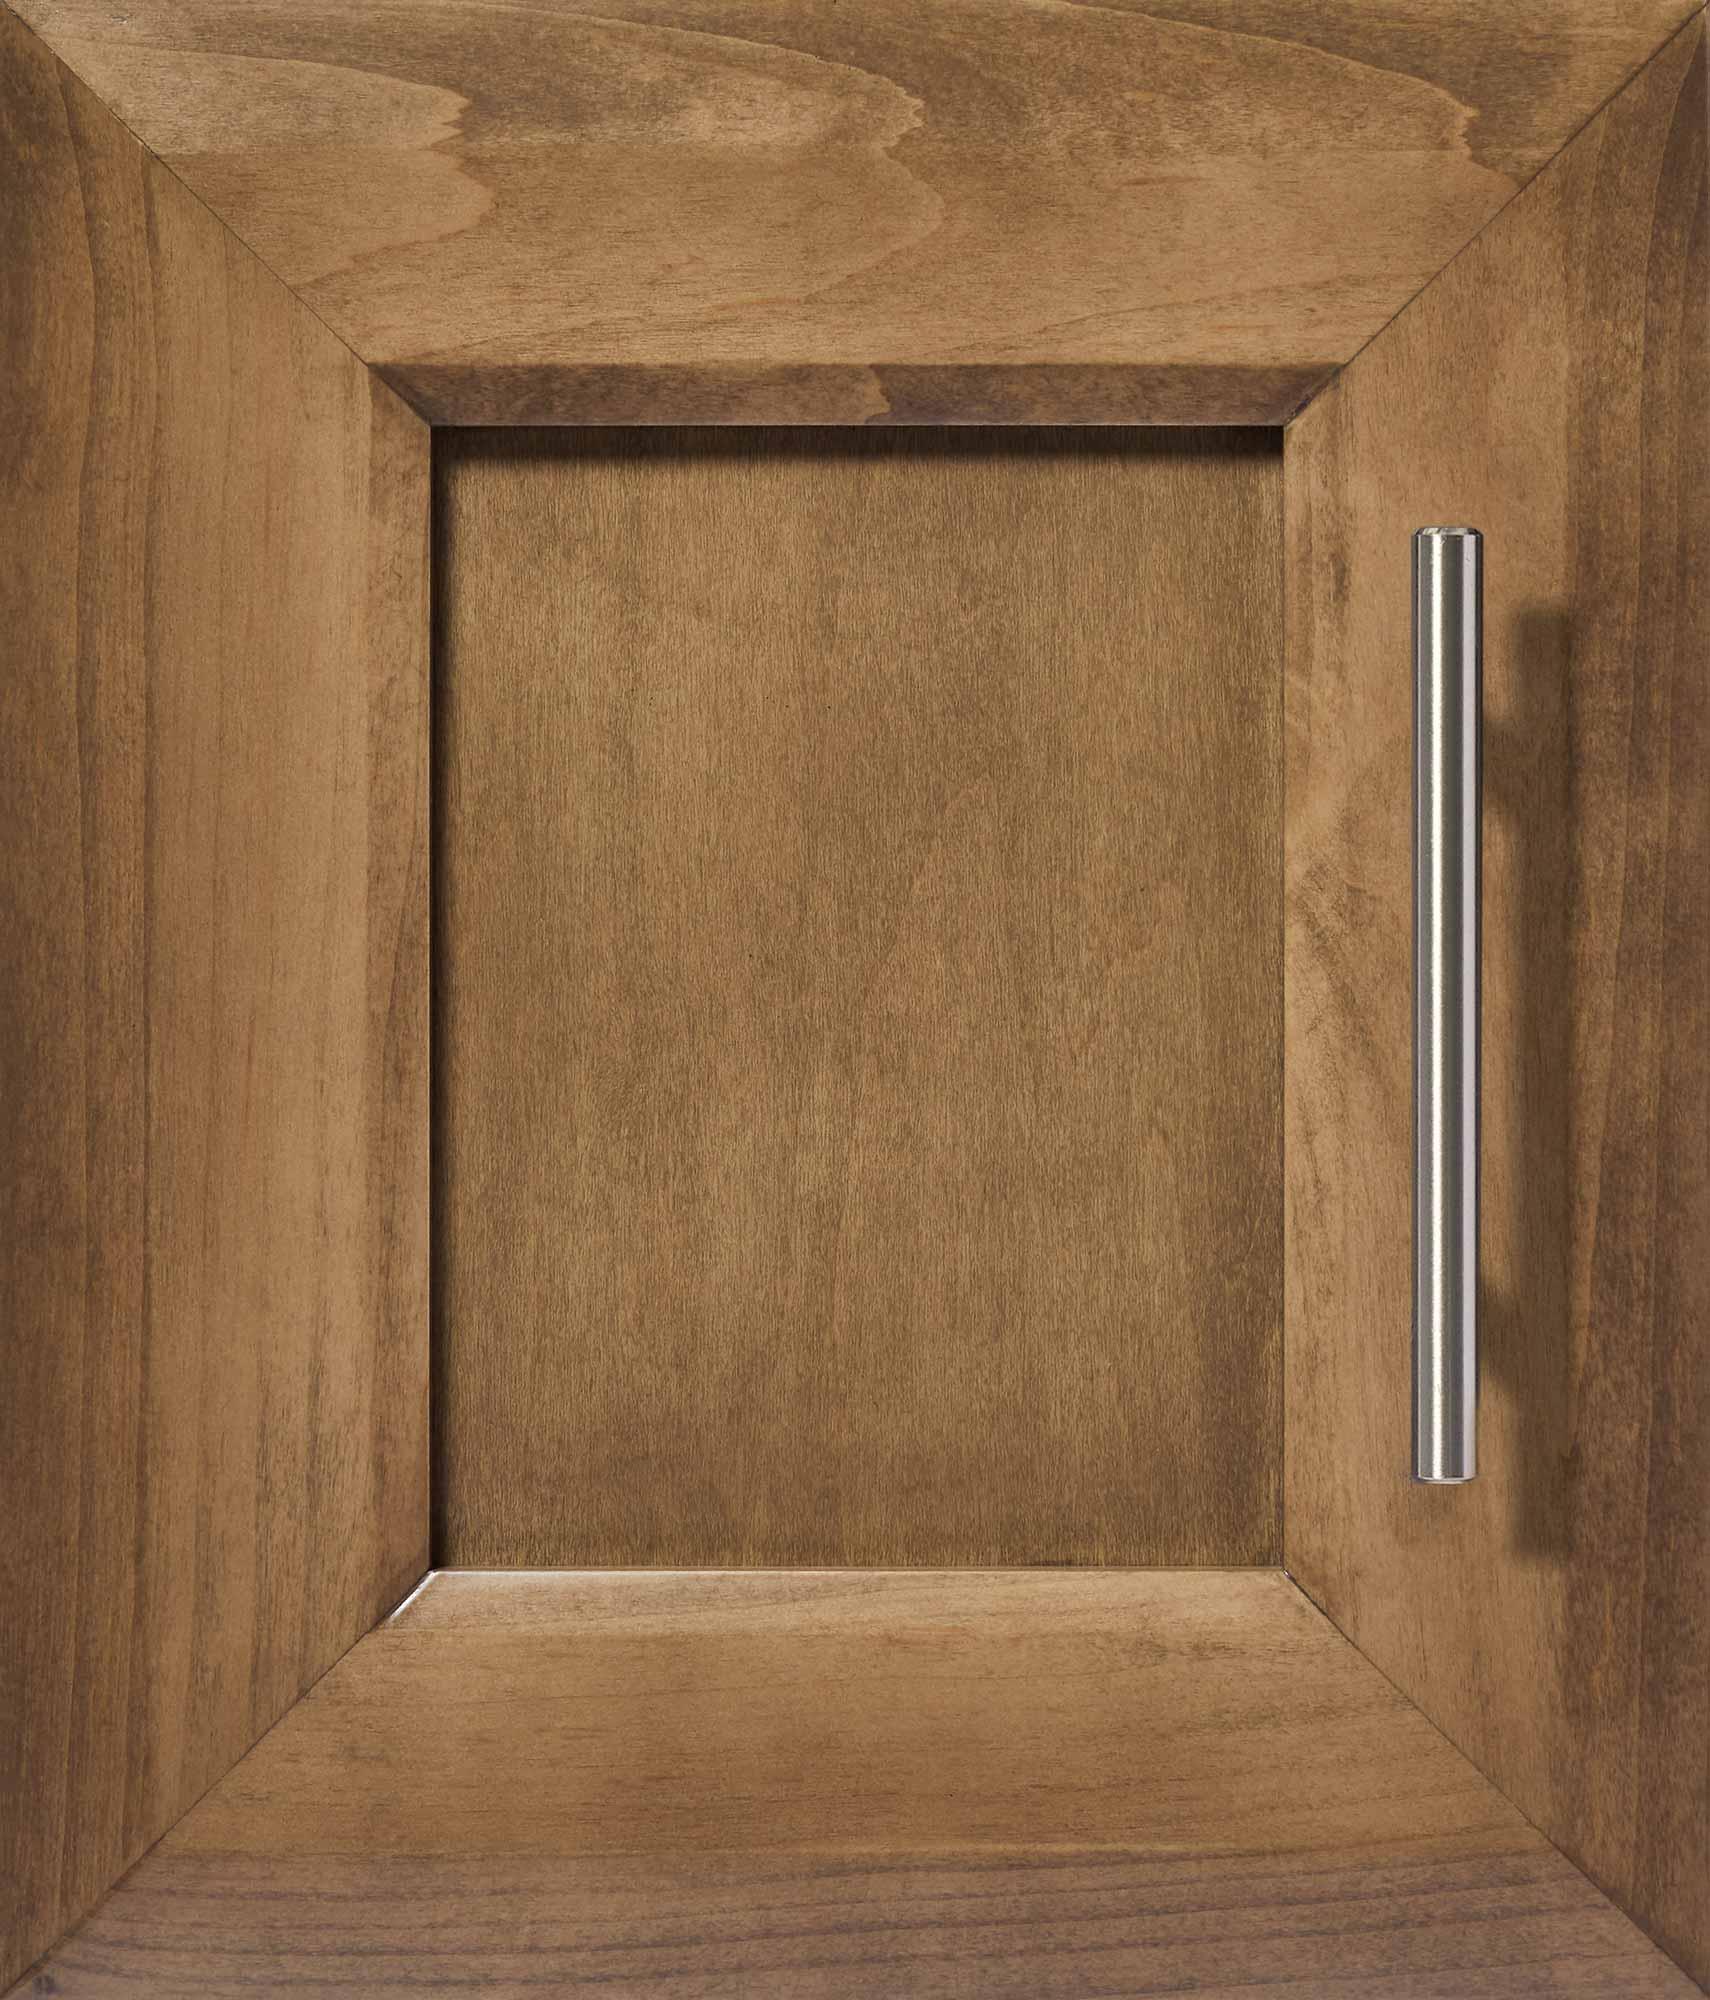 Sanibel Cabinetry